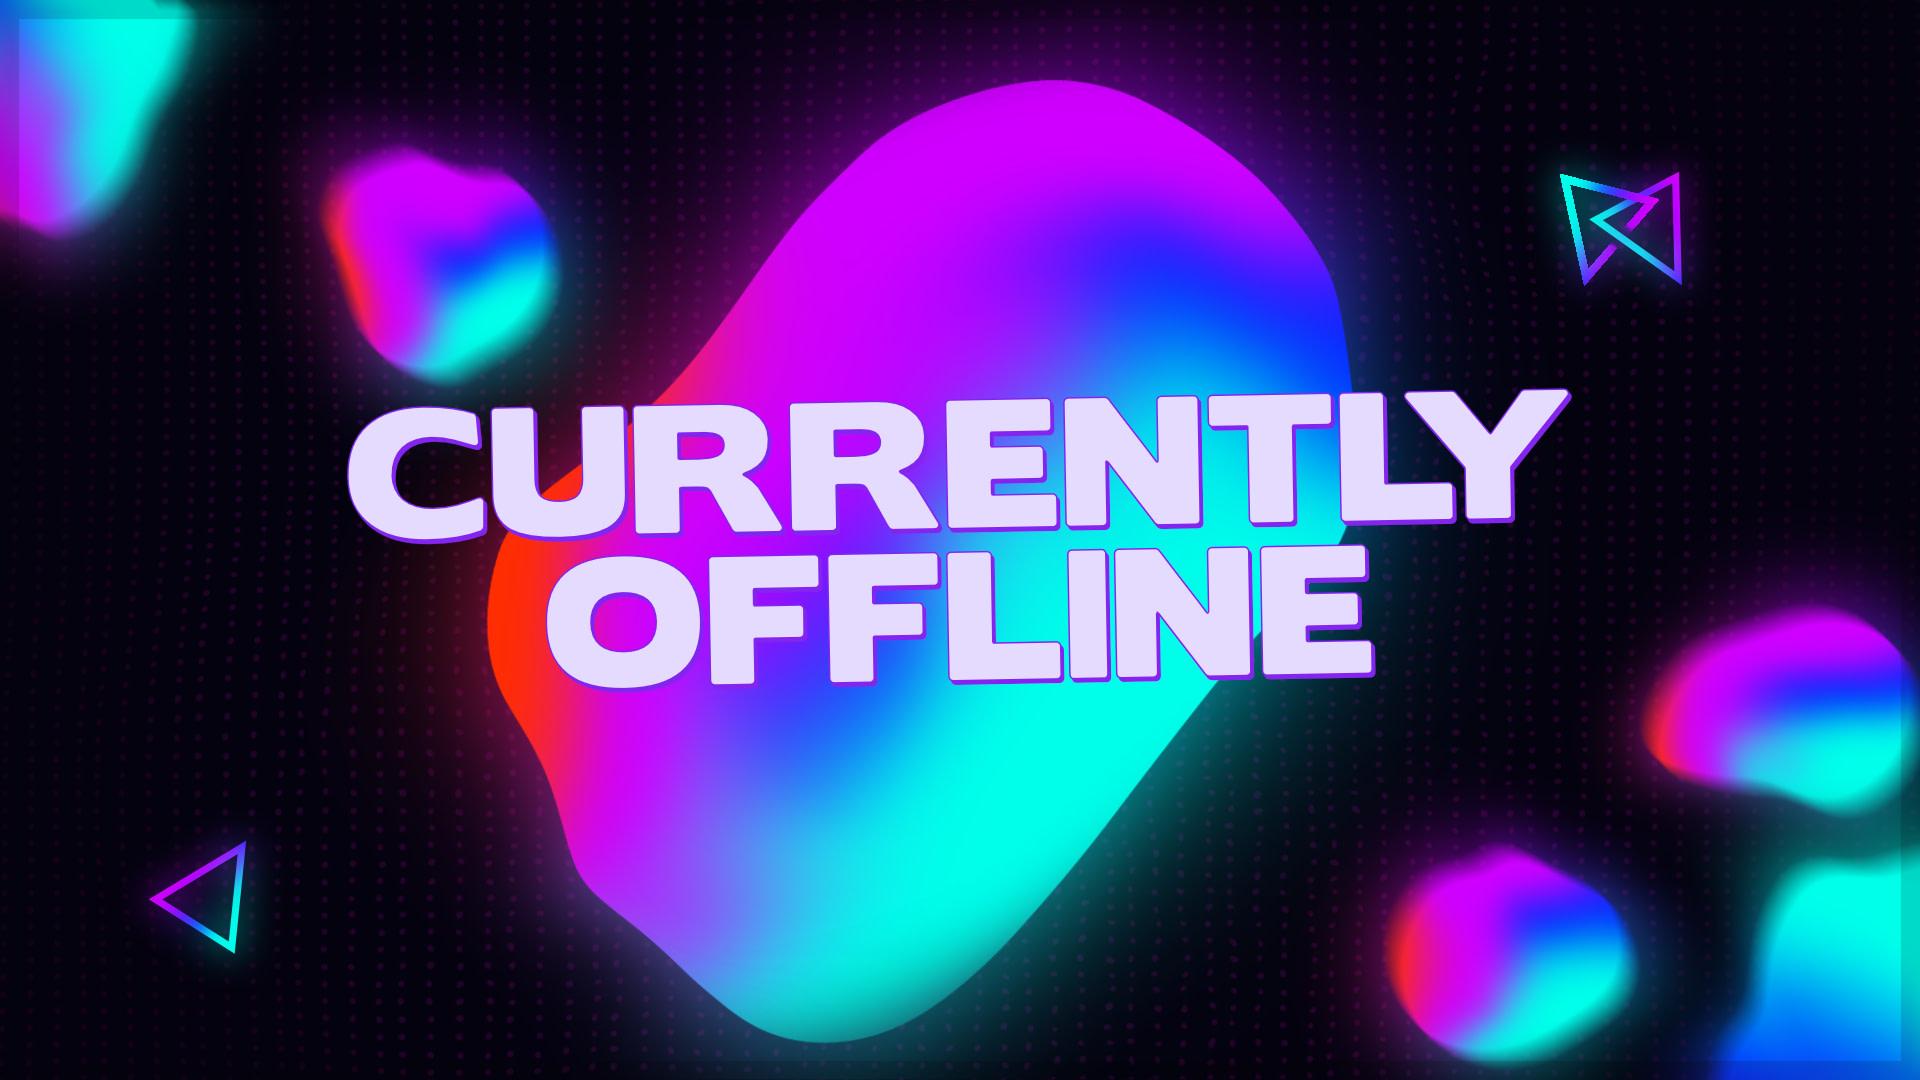 currentlyoffline